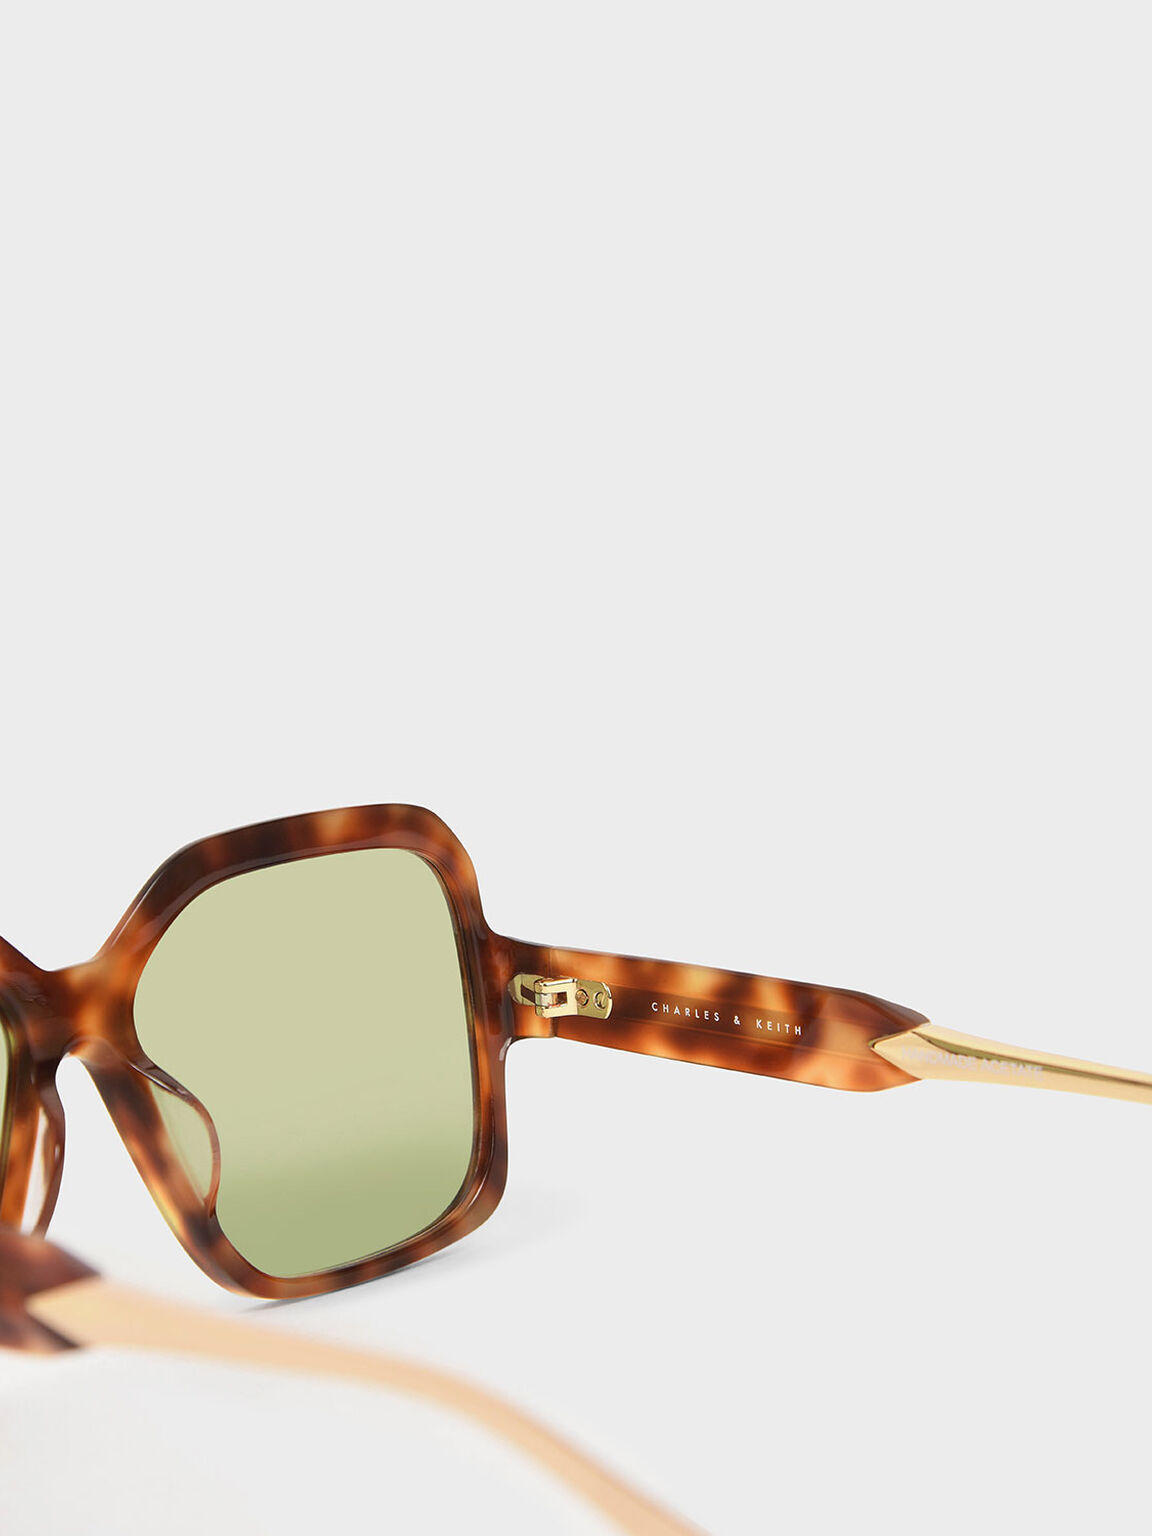 Tortoiseshell Oversized Square Sunglasses, T. Shell, hi-res